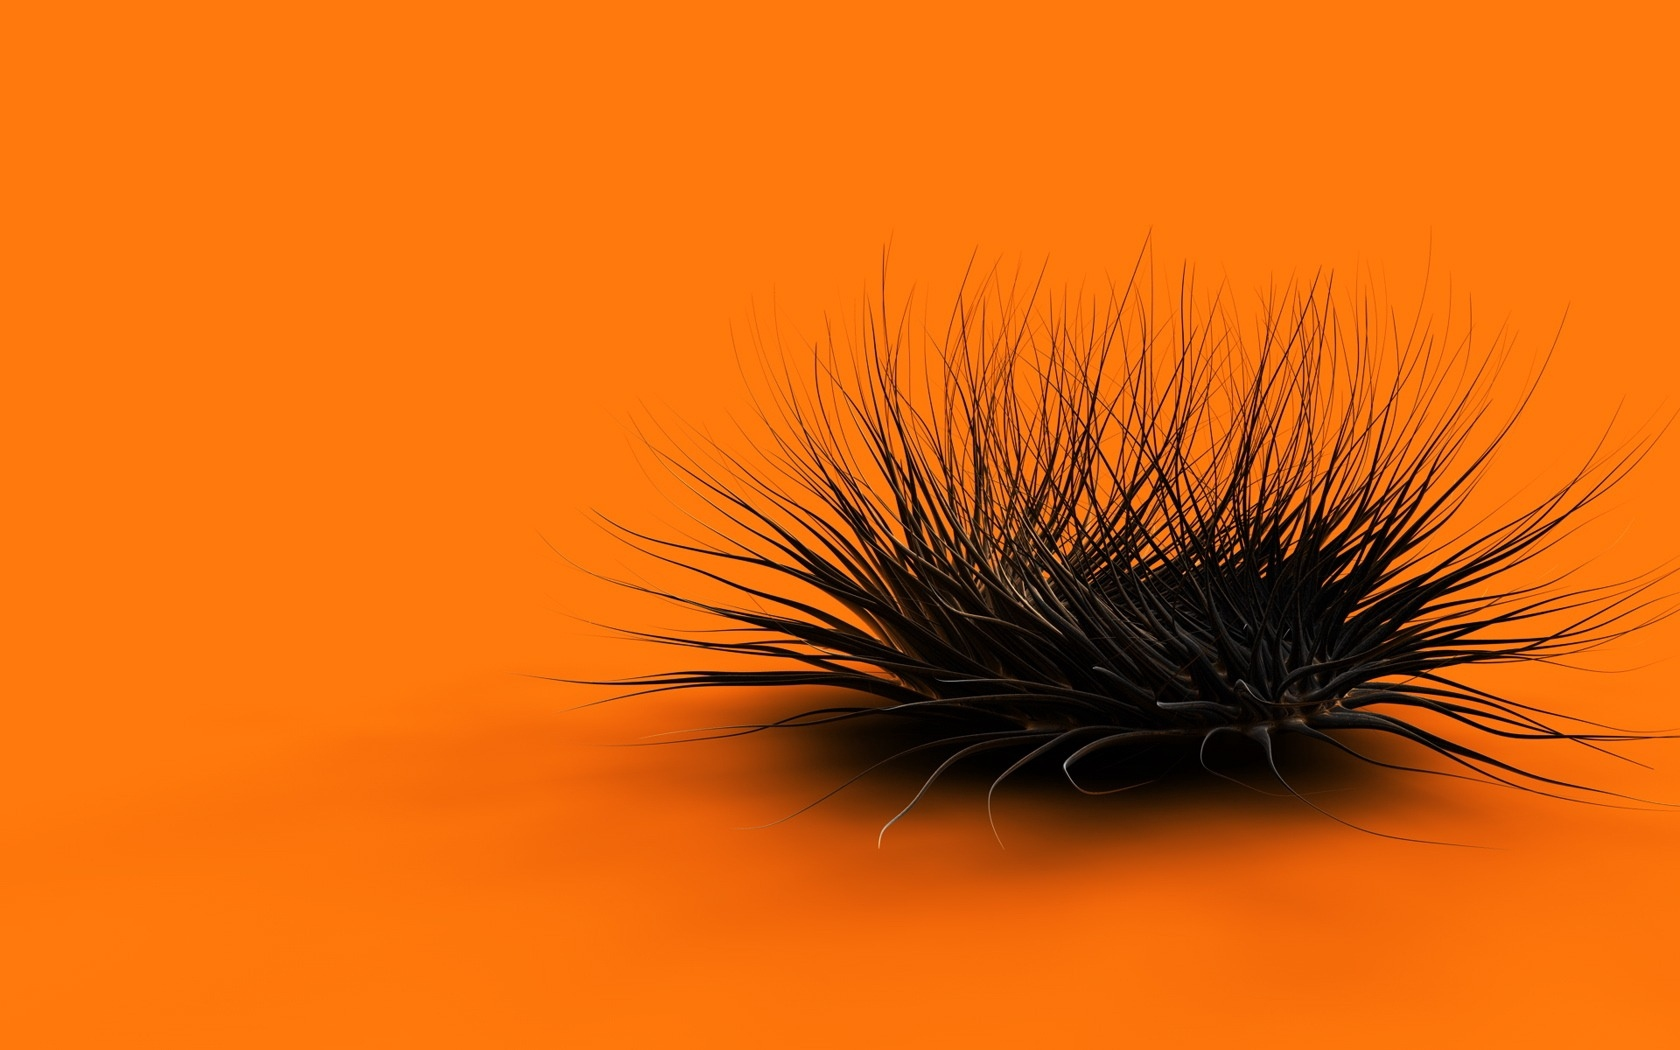 Orange Black Feathers Form   Stock Photos Images HD 1680x1050